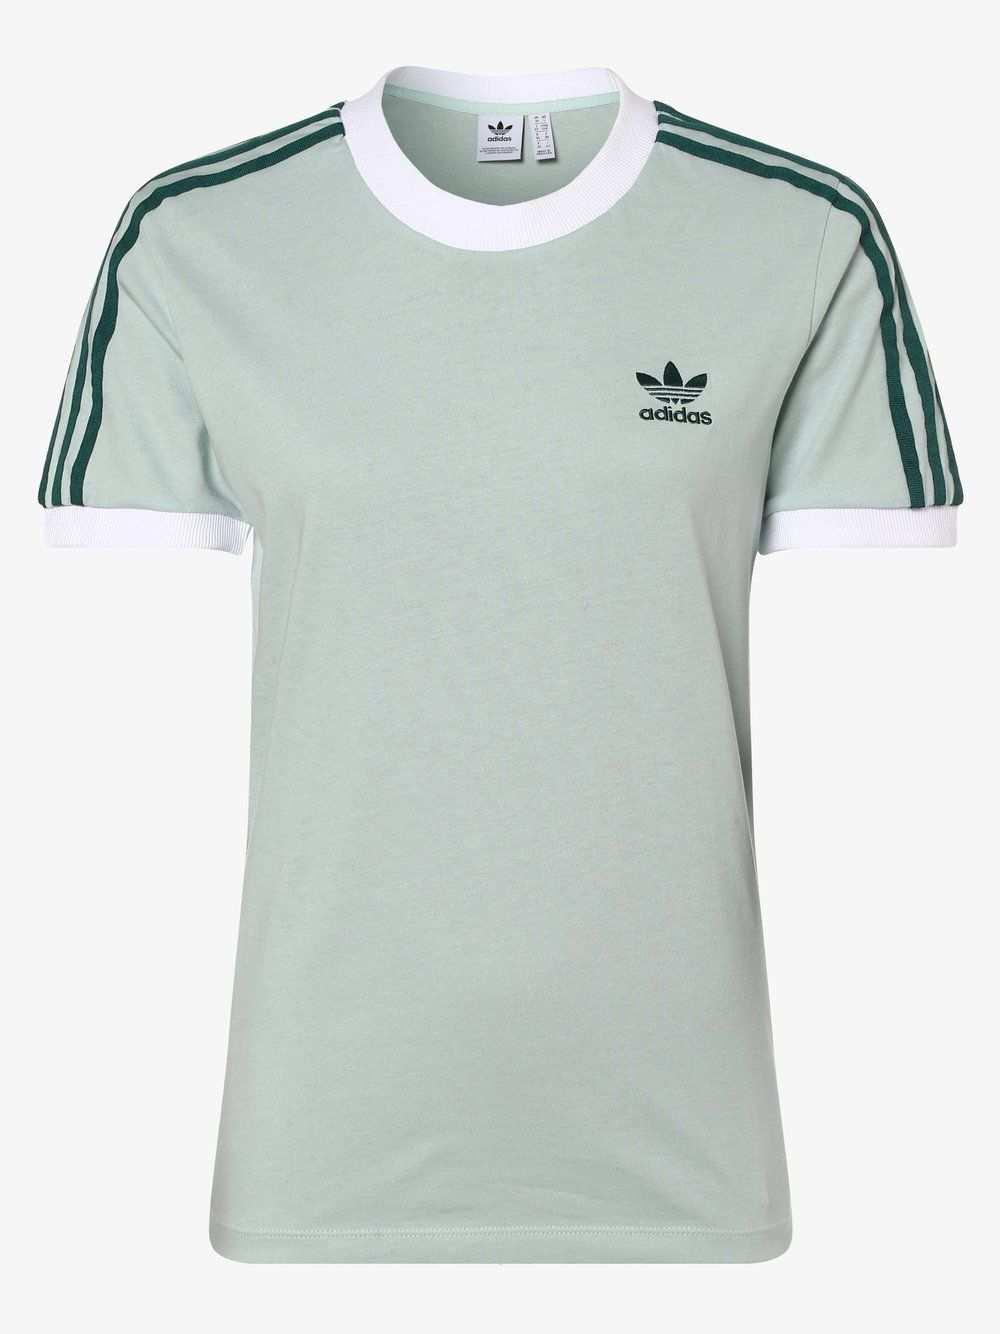 Adidas Originals Damen T Shirt Online Kaufen In 2020 Adidas Originals T Shirt Damen Adidas Originals Damen